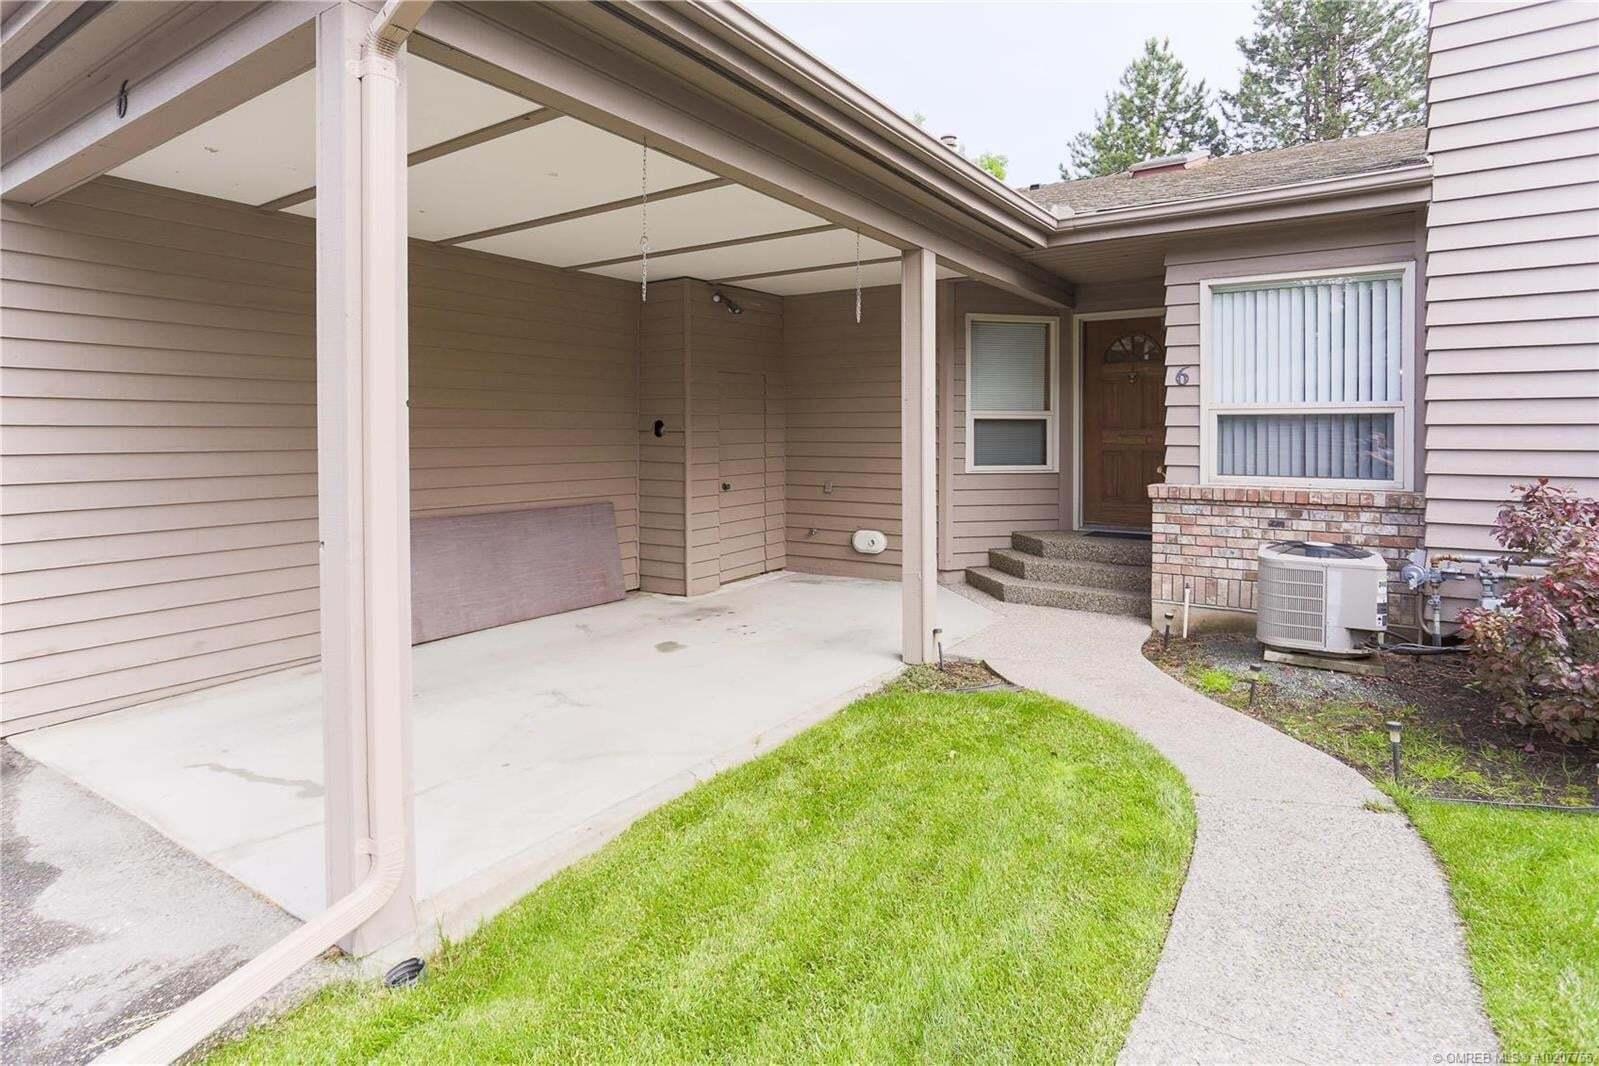 Townhouse for sale at 1530 Kelglen Cres Kelowna British Columbia - MLS: 10207755